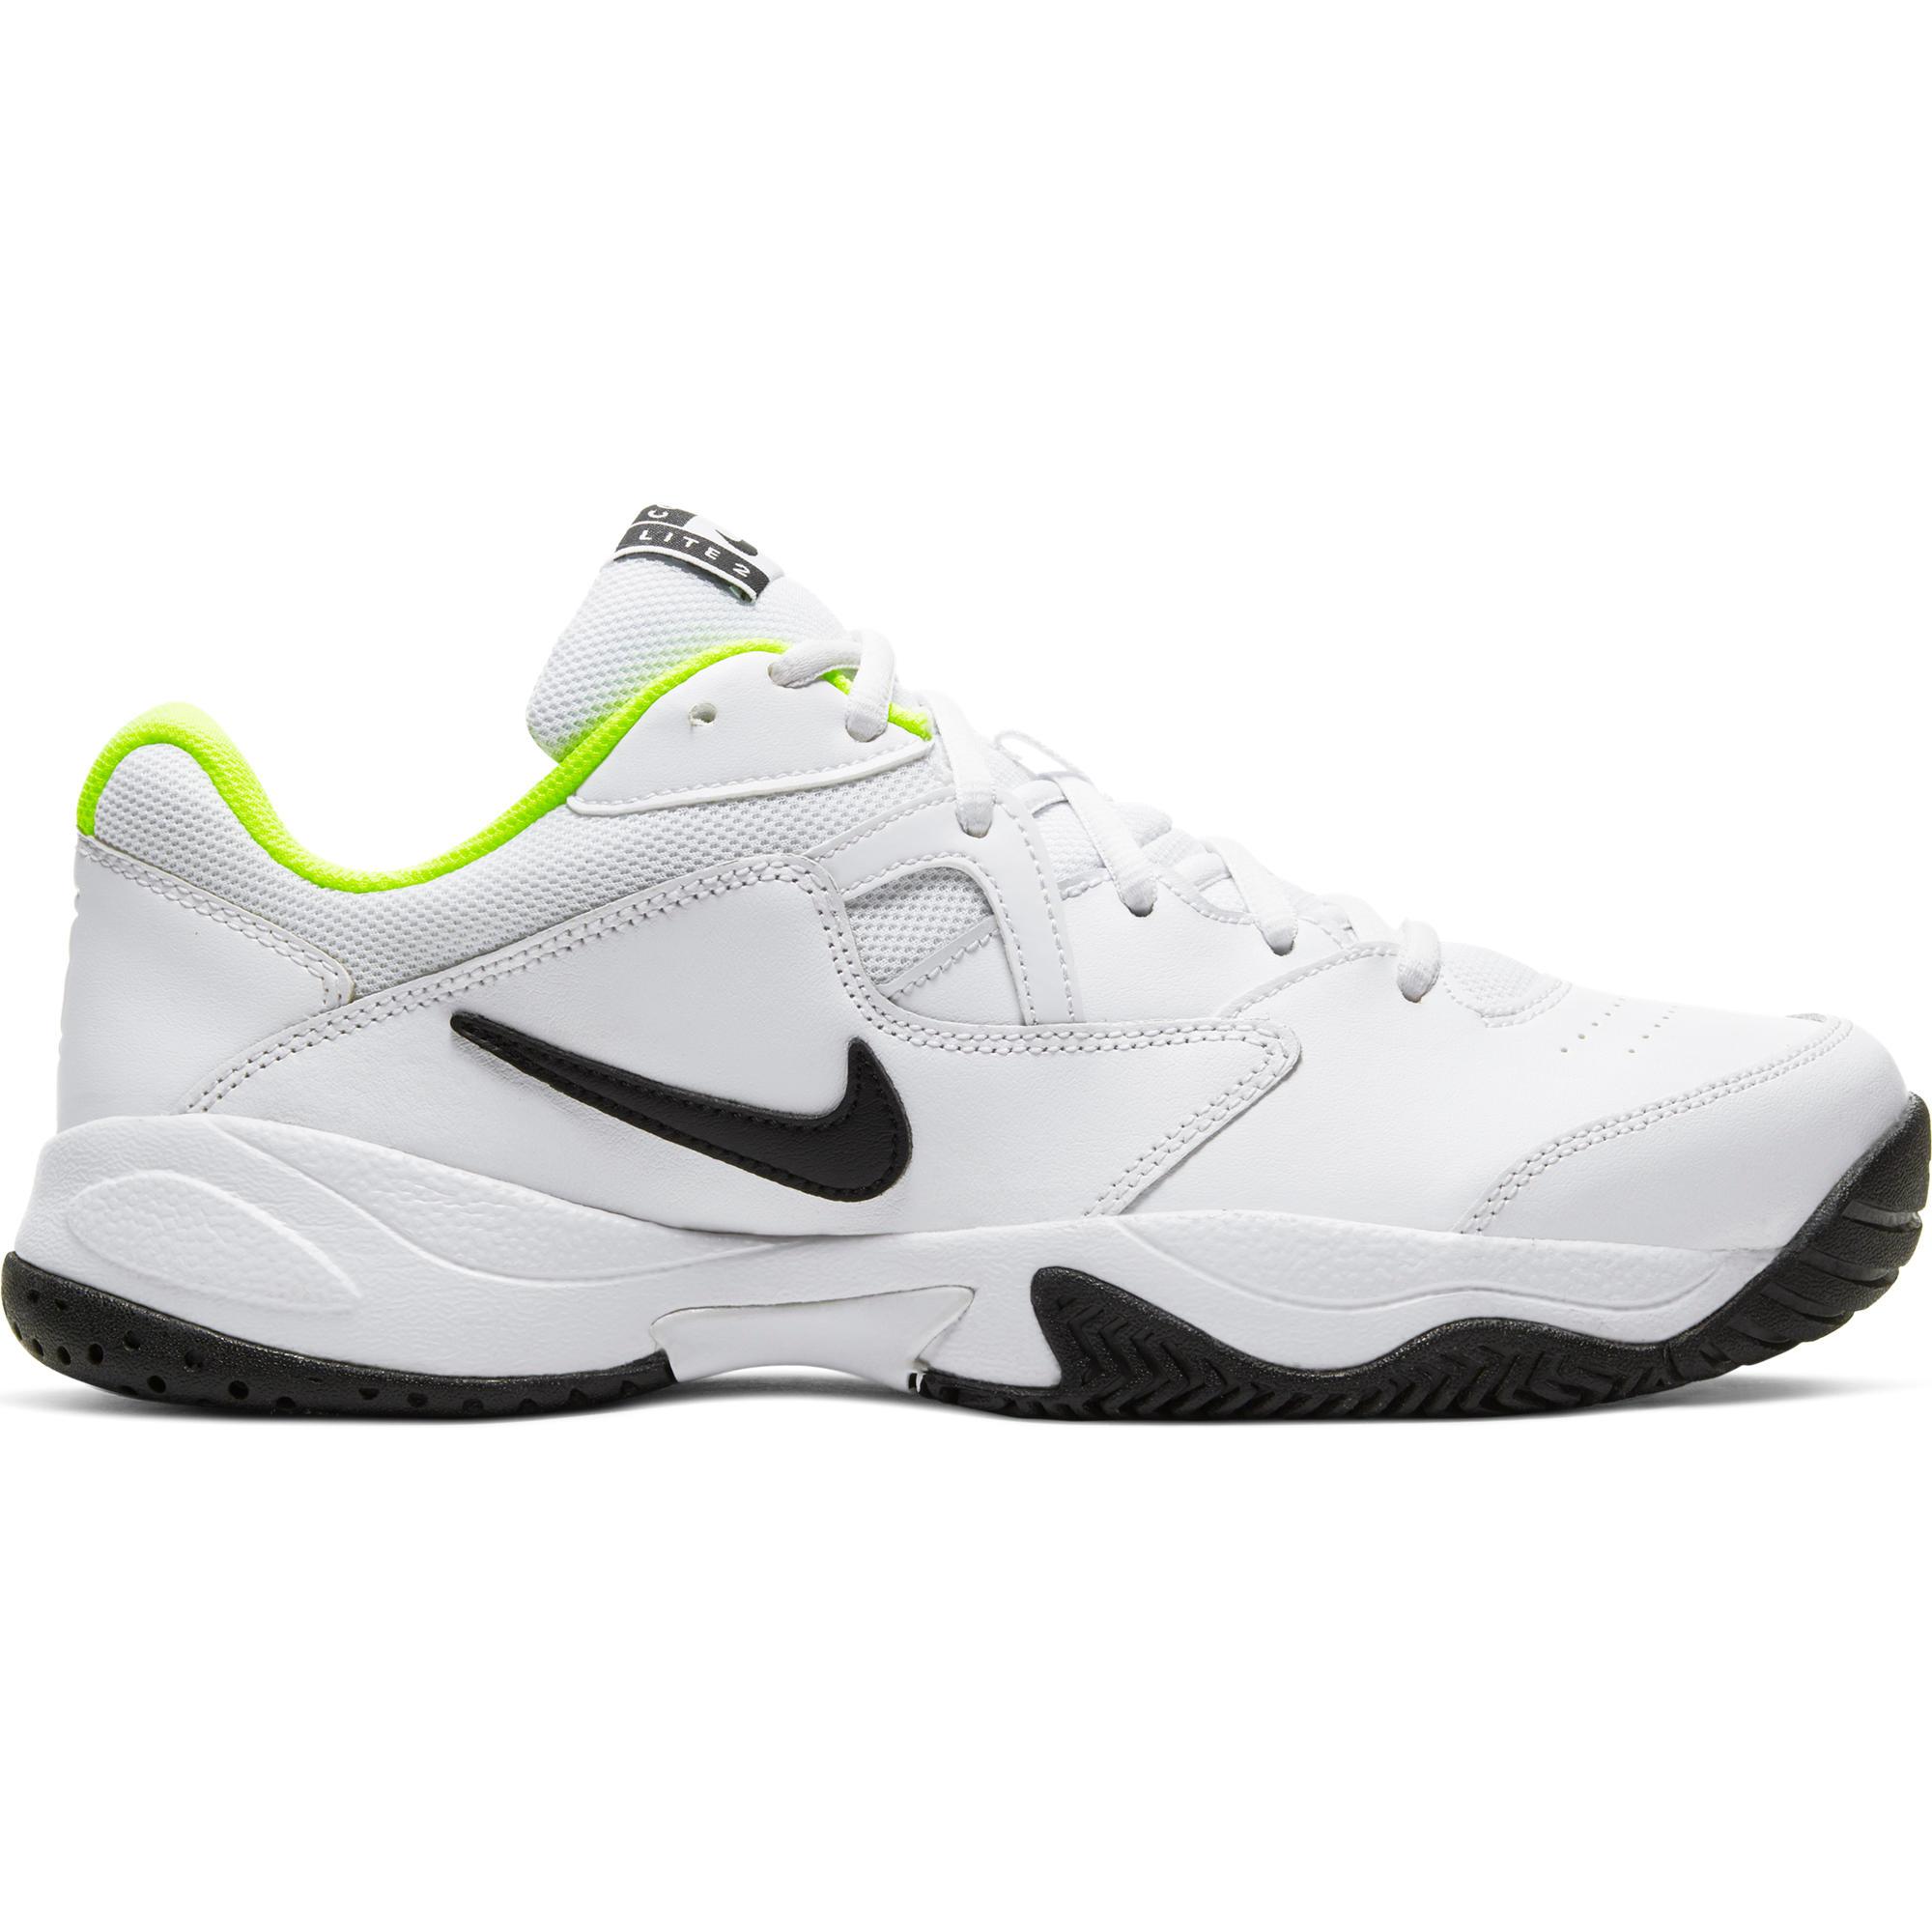 Mercado Zumbido Asumir  Zapatillas De Tenis Nike Court Lite 2 Multiterreno Hombre Blanco NIKE |  Decathlon